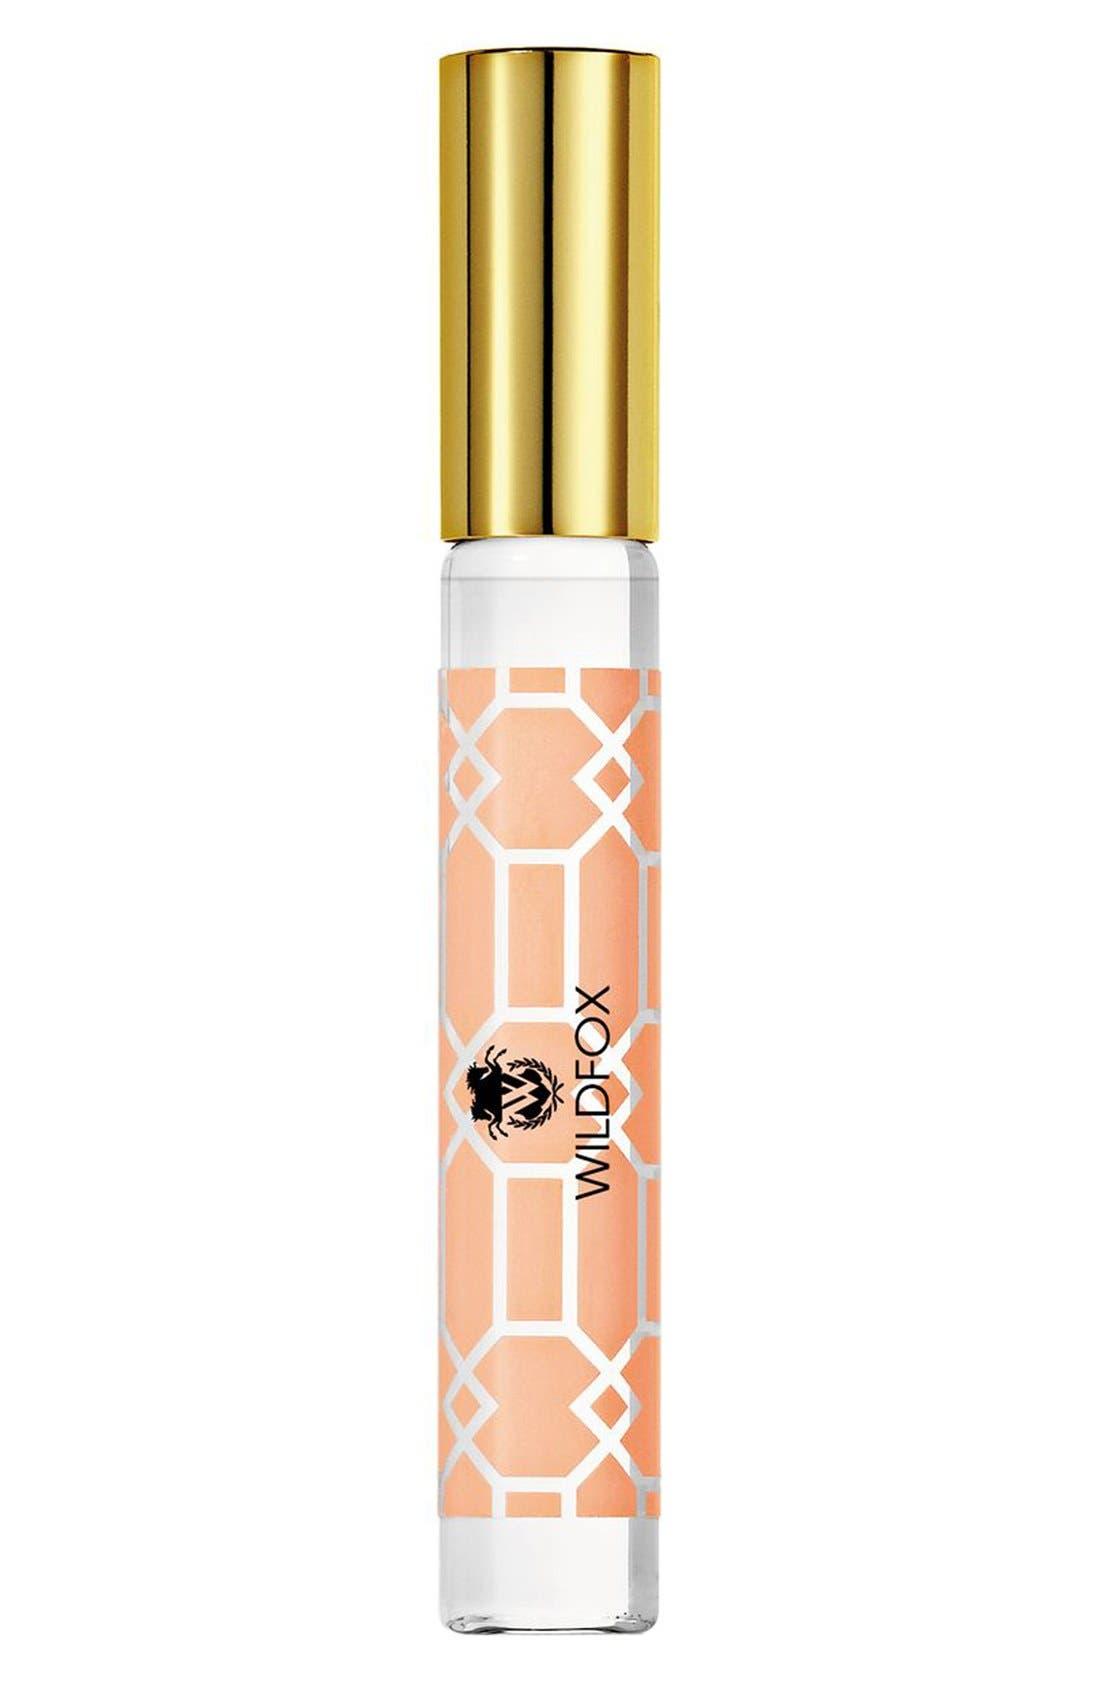 WILDFOX, Eau de Parfum Rollerball, Main thumbnail 1, color, NO COLOR